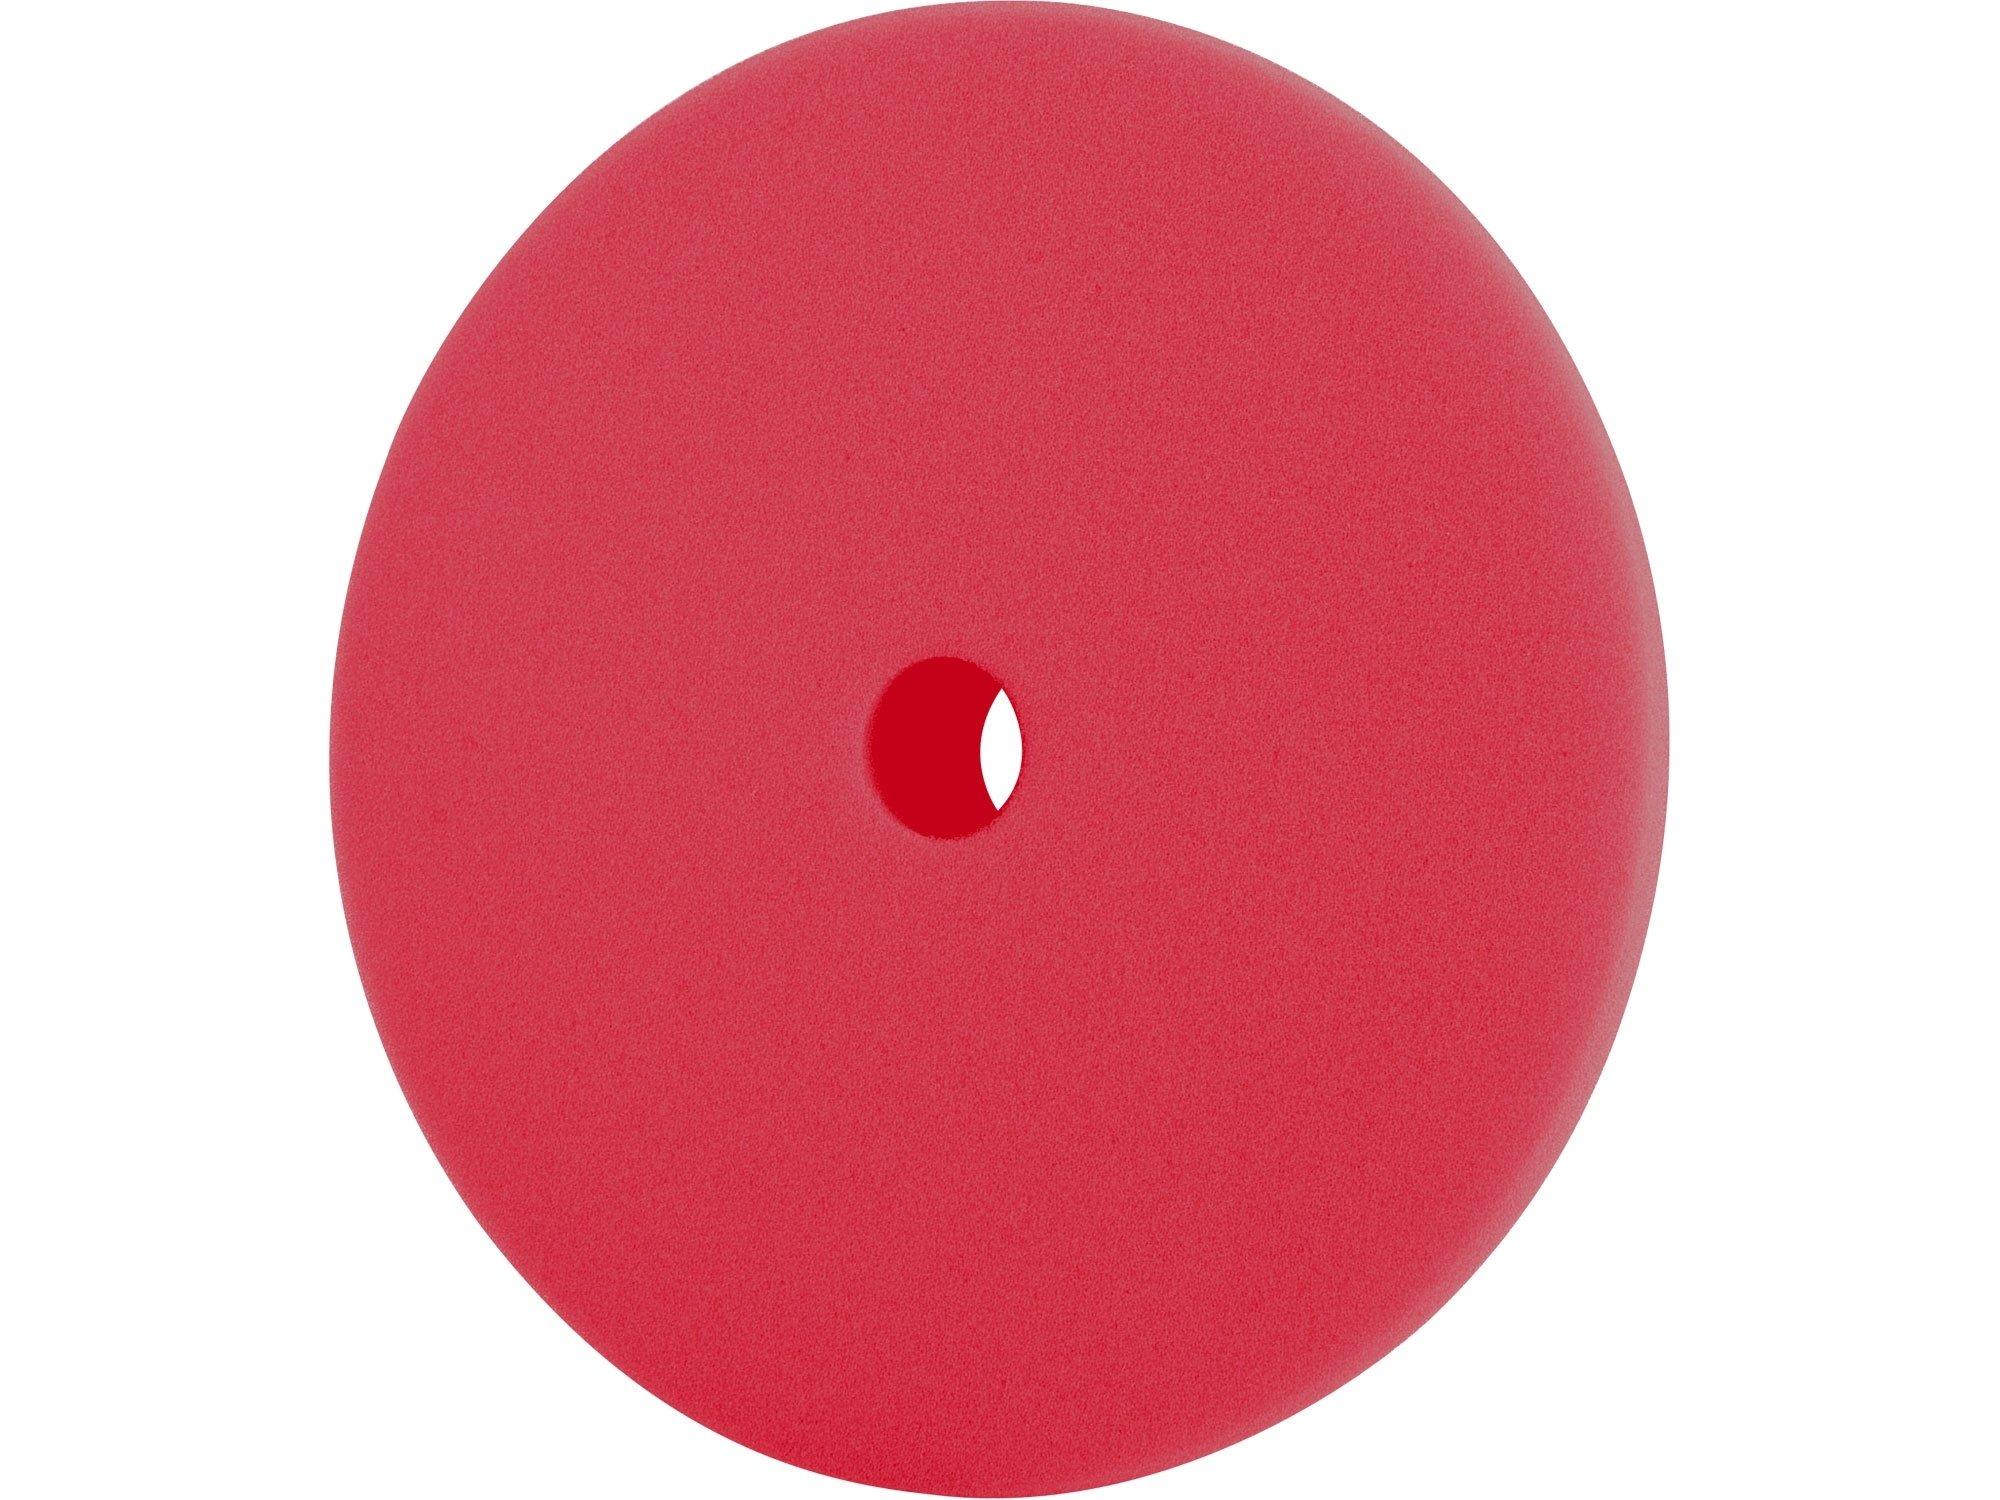 Kotouč lešticí pěnový na suchý zip T10 Extol Premium - 8804551 180mm